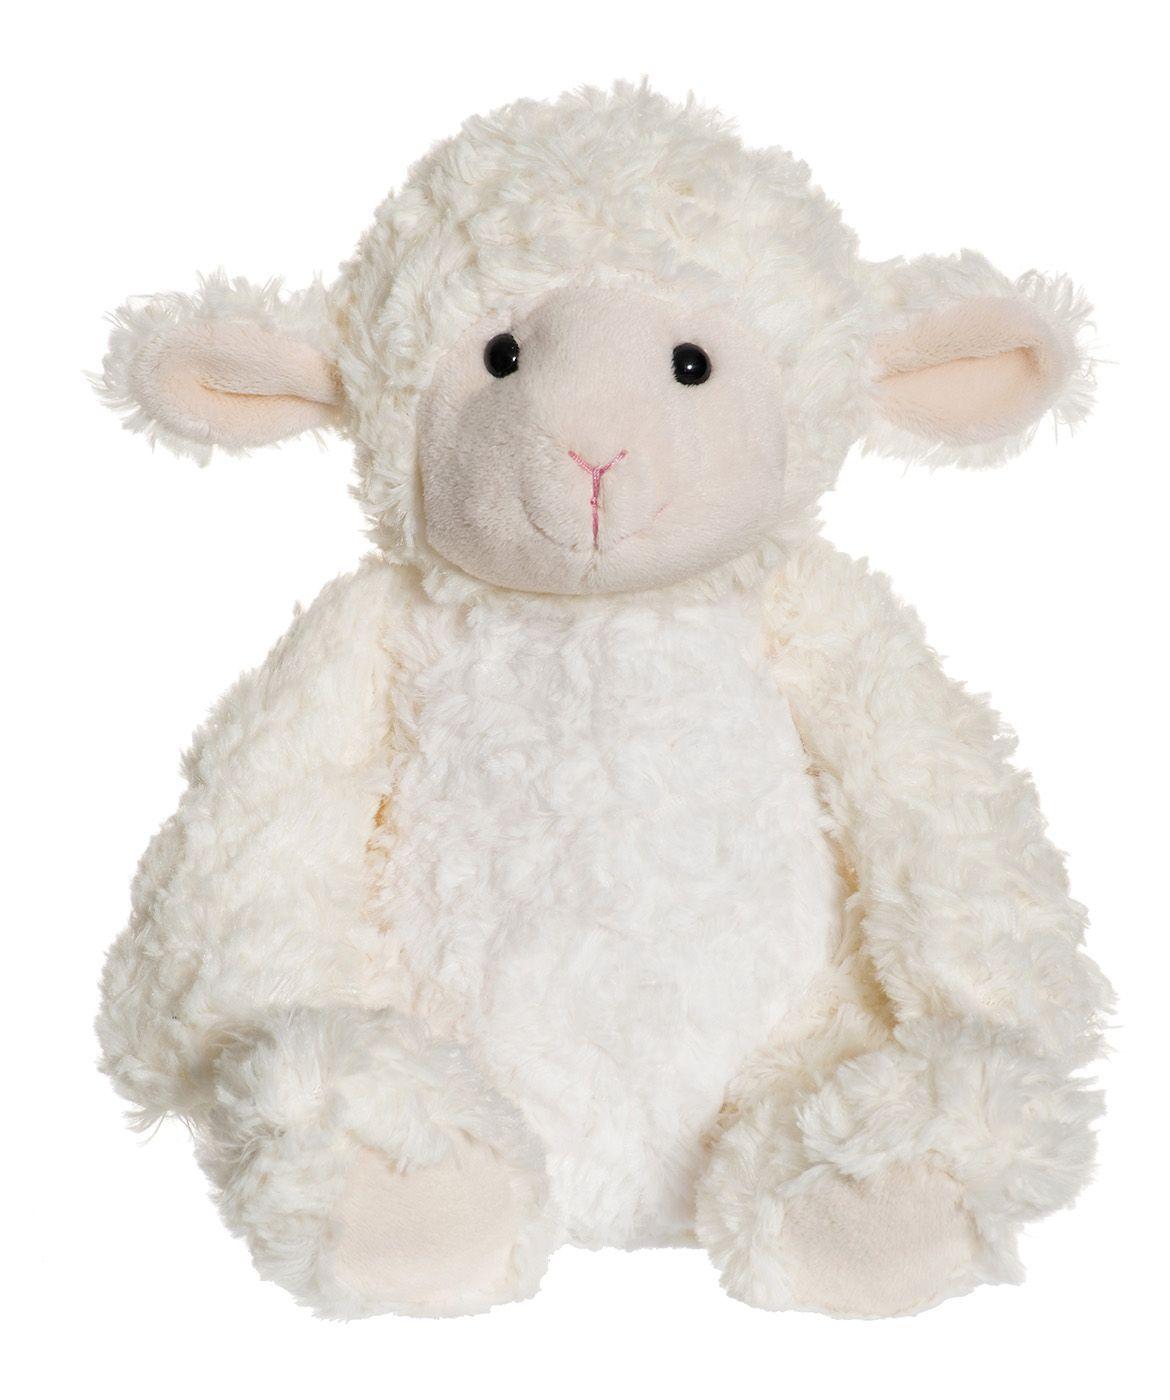 Image of Lam fra Teddykompaniet - Softies - Lilly (28 cm) (2720)